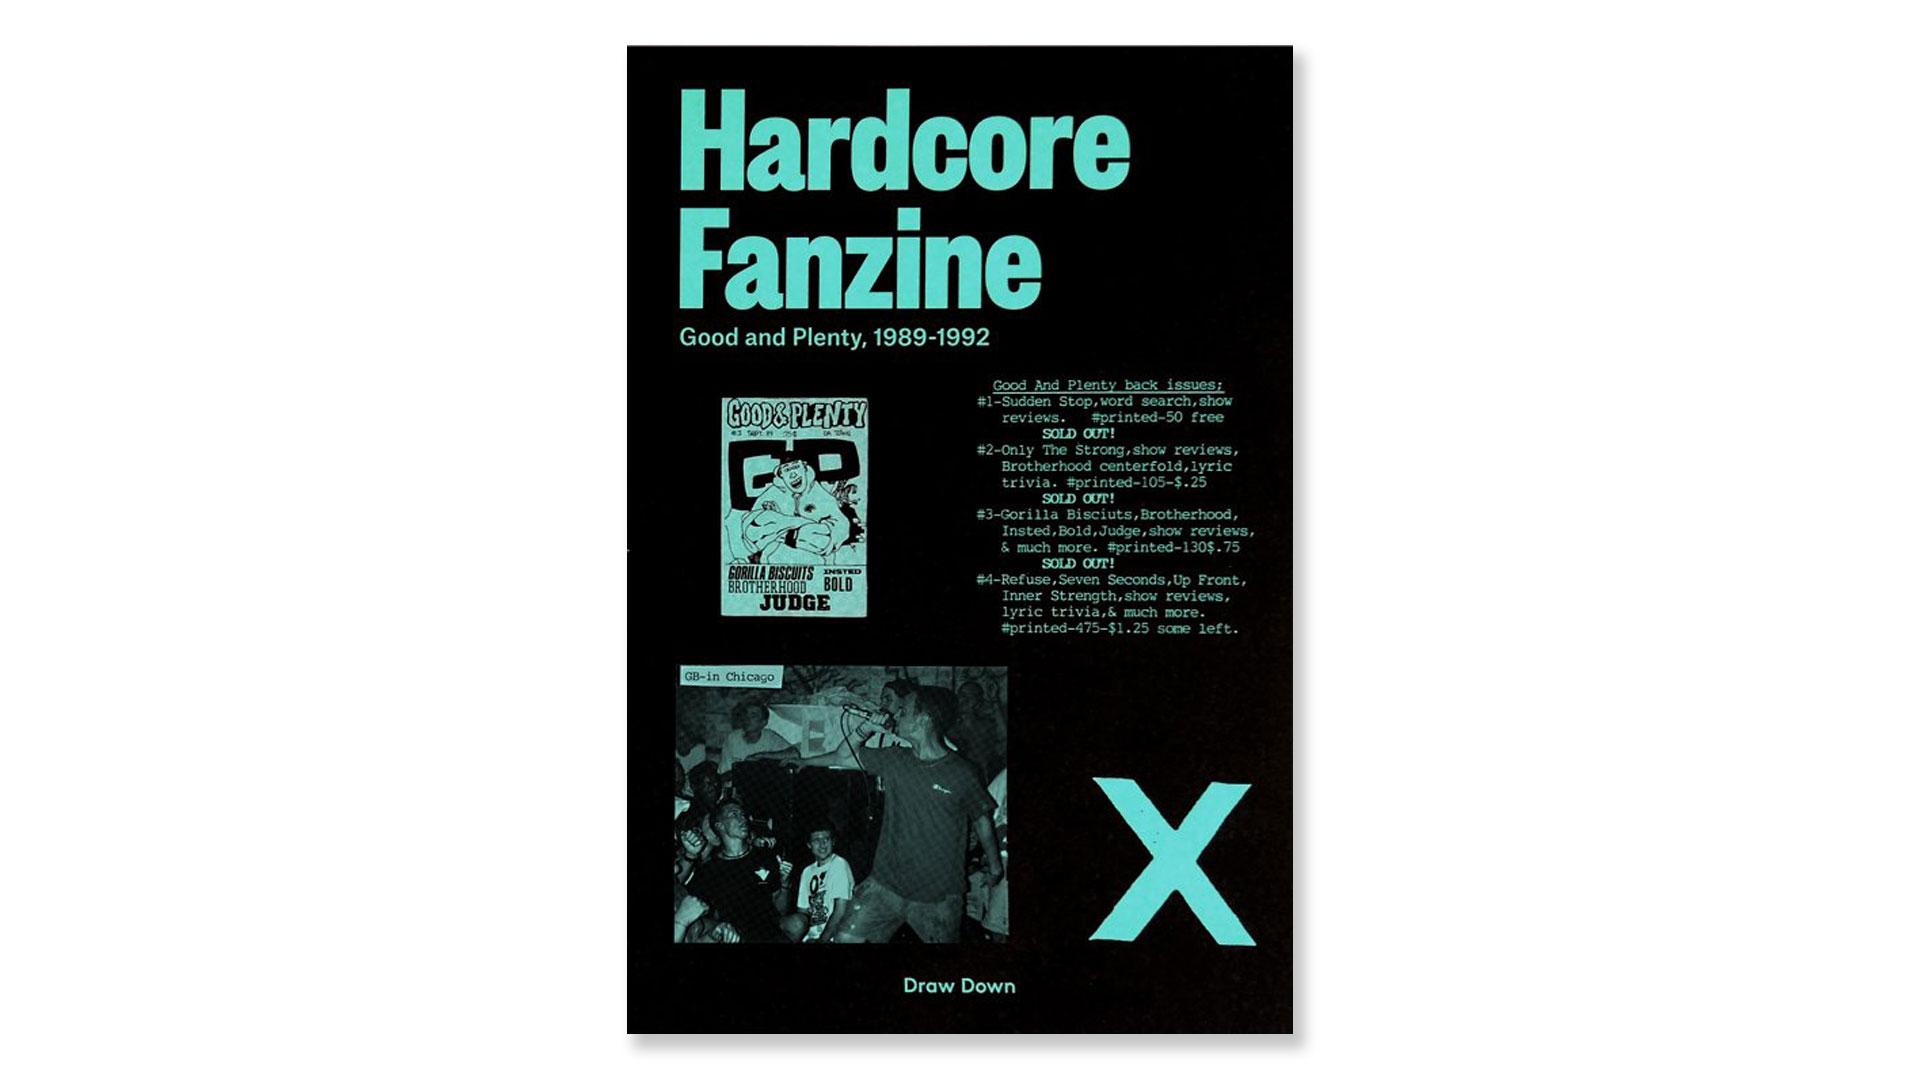 HardcoreFanzine